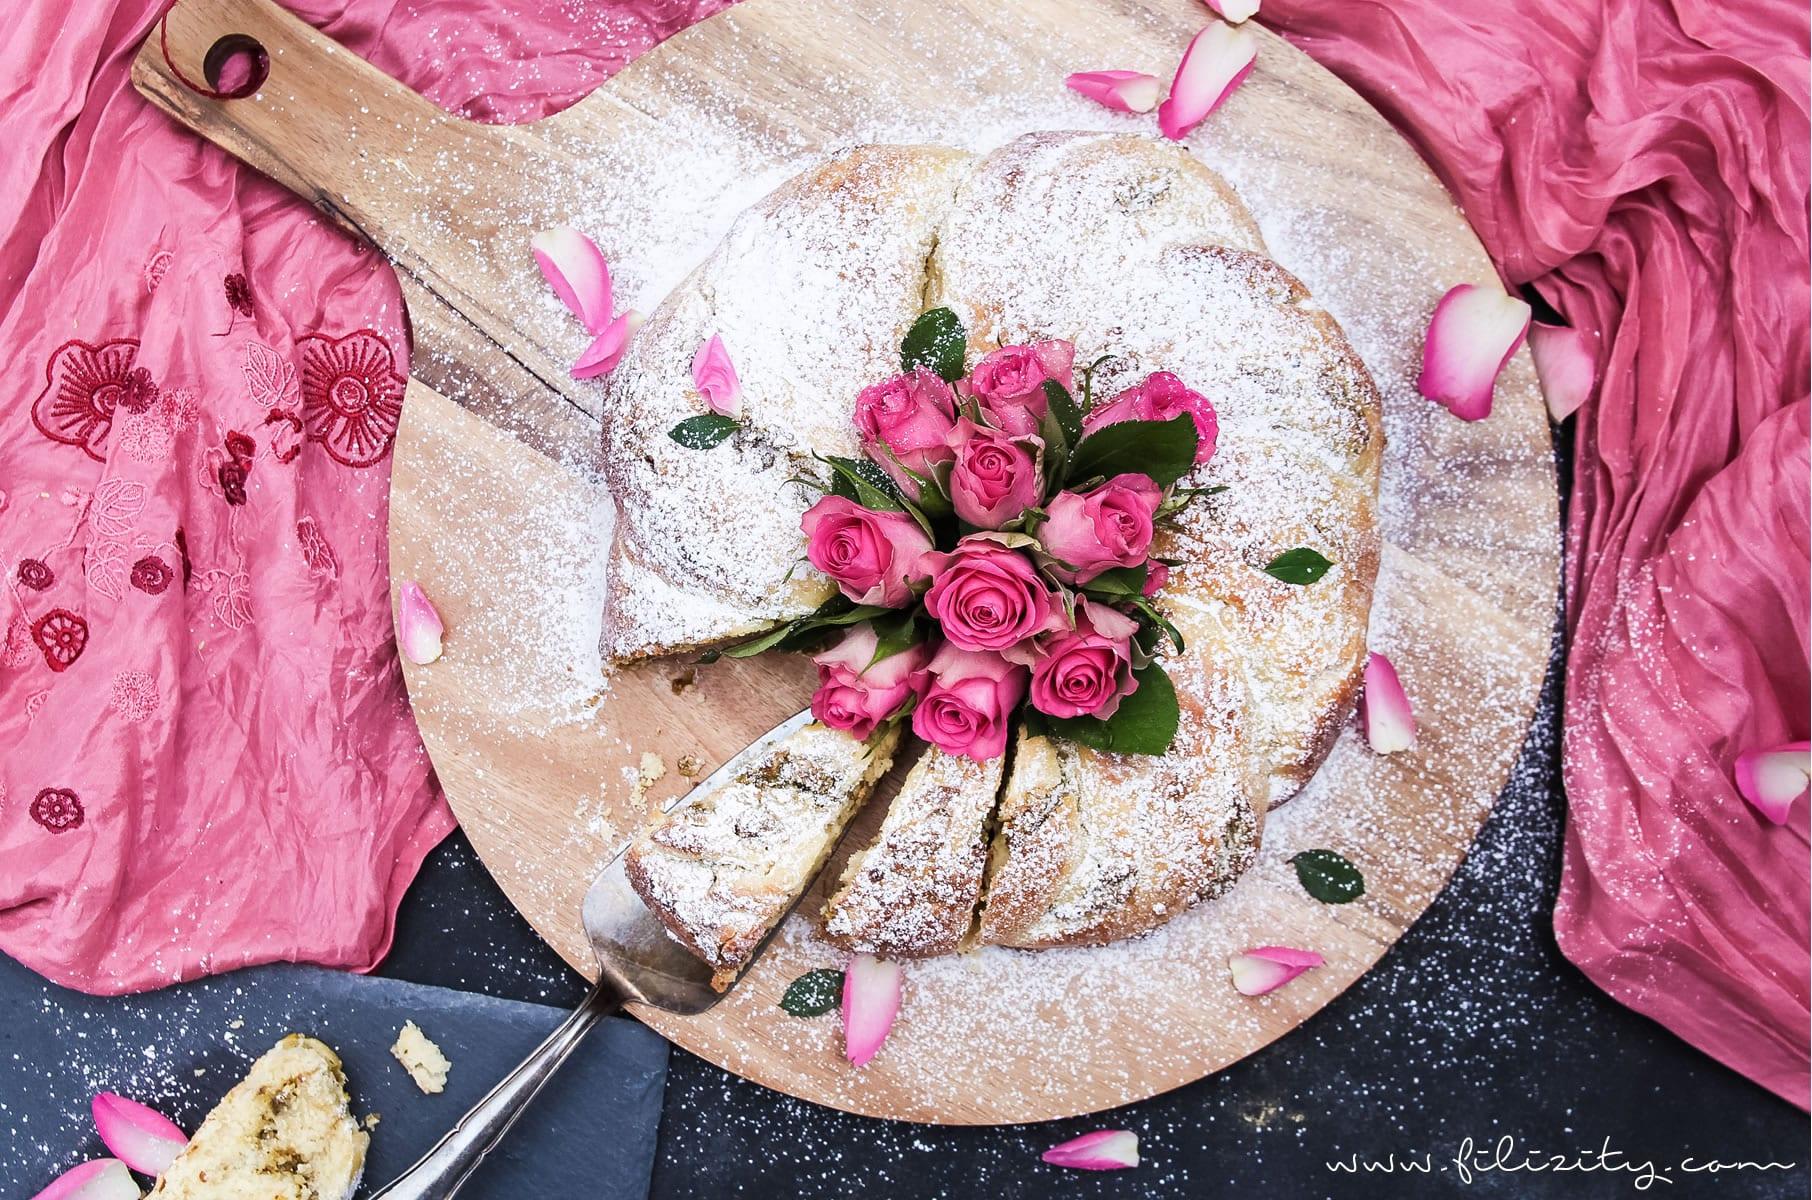 Osterkranz Rezept mit Pistazien-Rosen-Füllung